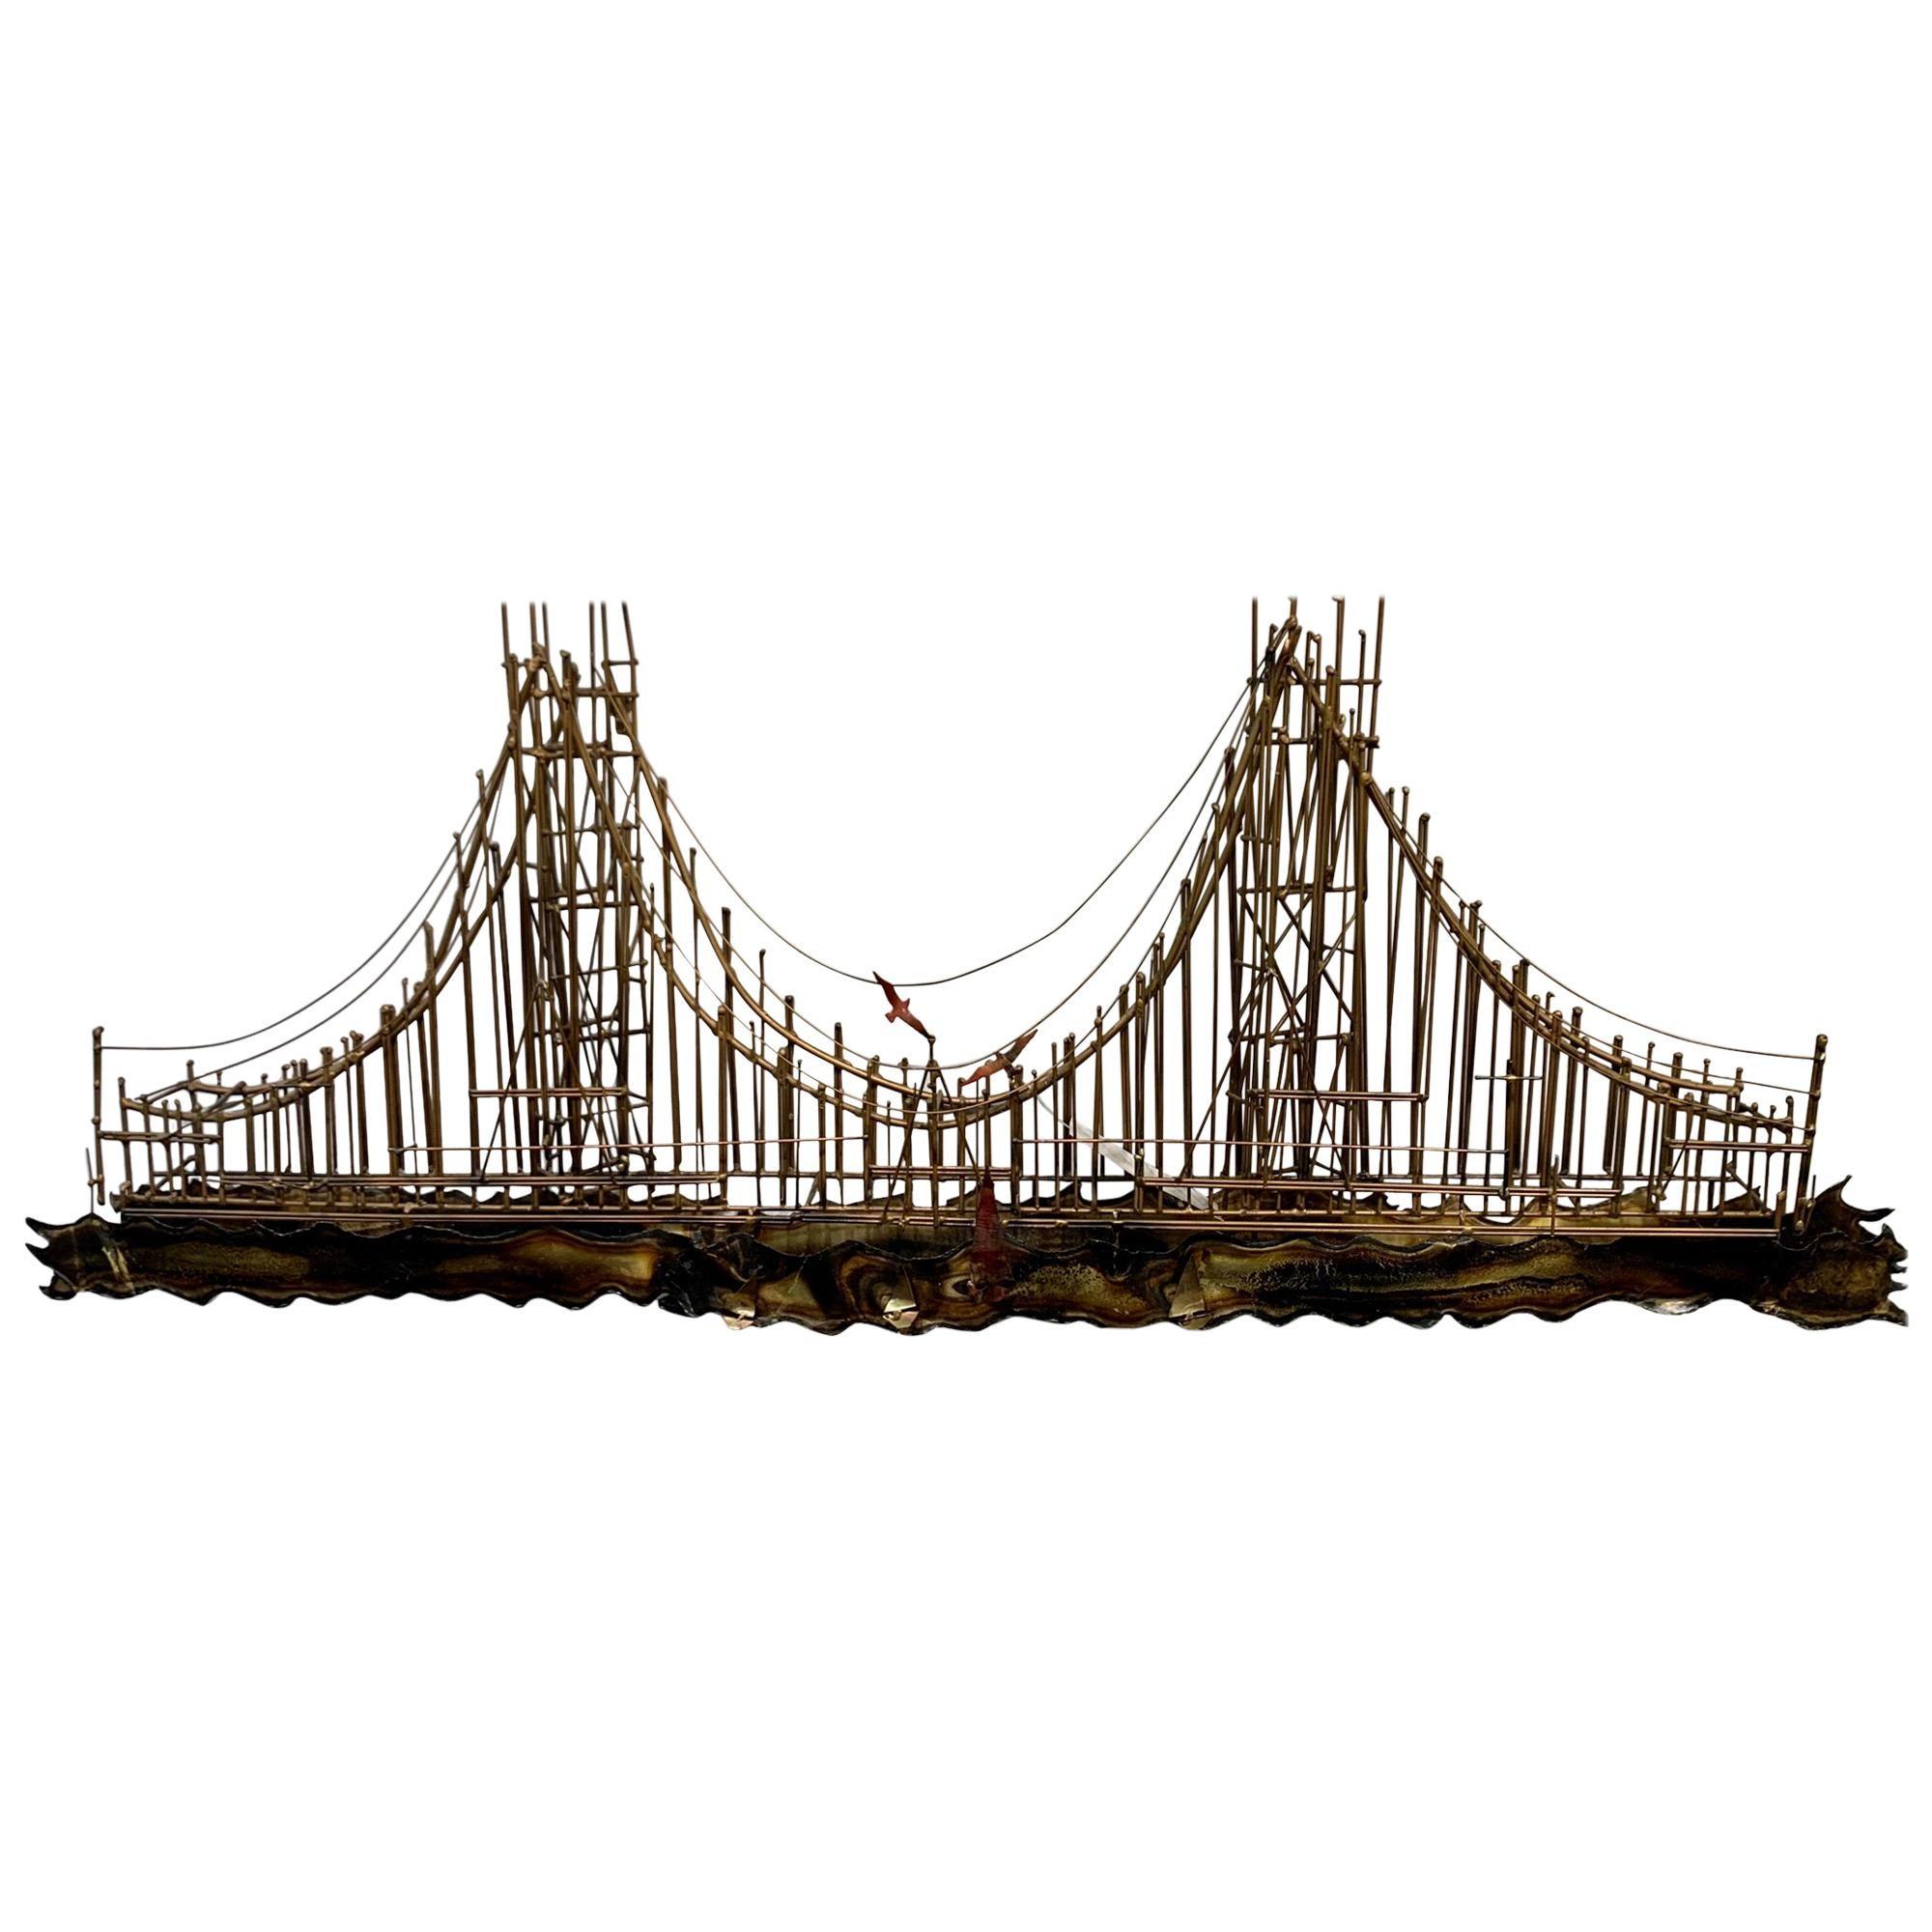 Vintage Midcentury Brutalist Metal Sculpture, Wall Art of a Bridge